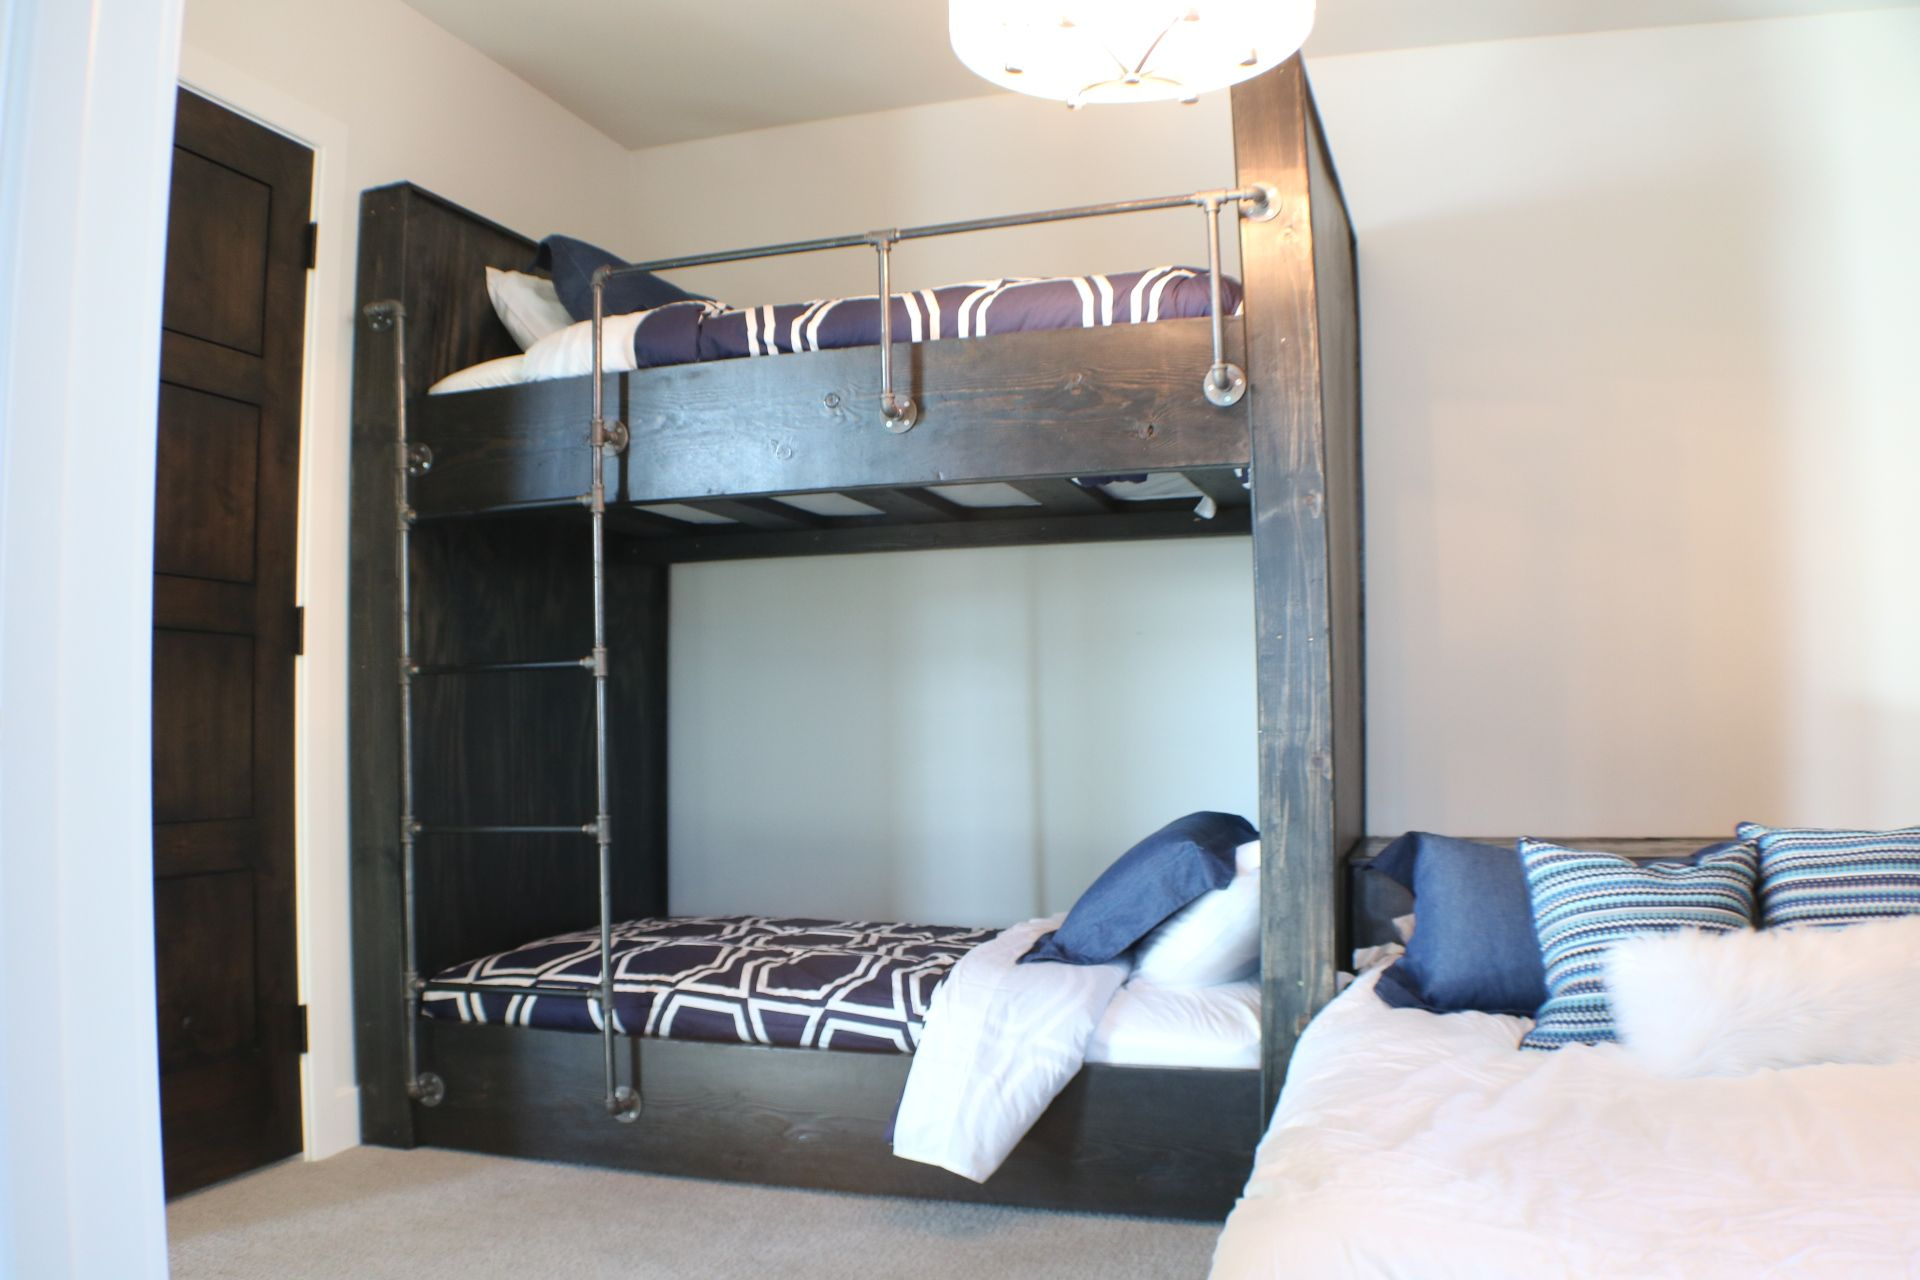 Best Custom Bunk Bed From Parkcitybunkbeds Com Nationwide 400 x 300